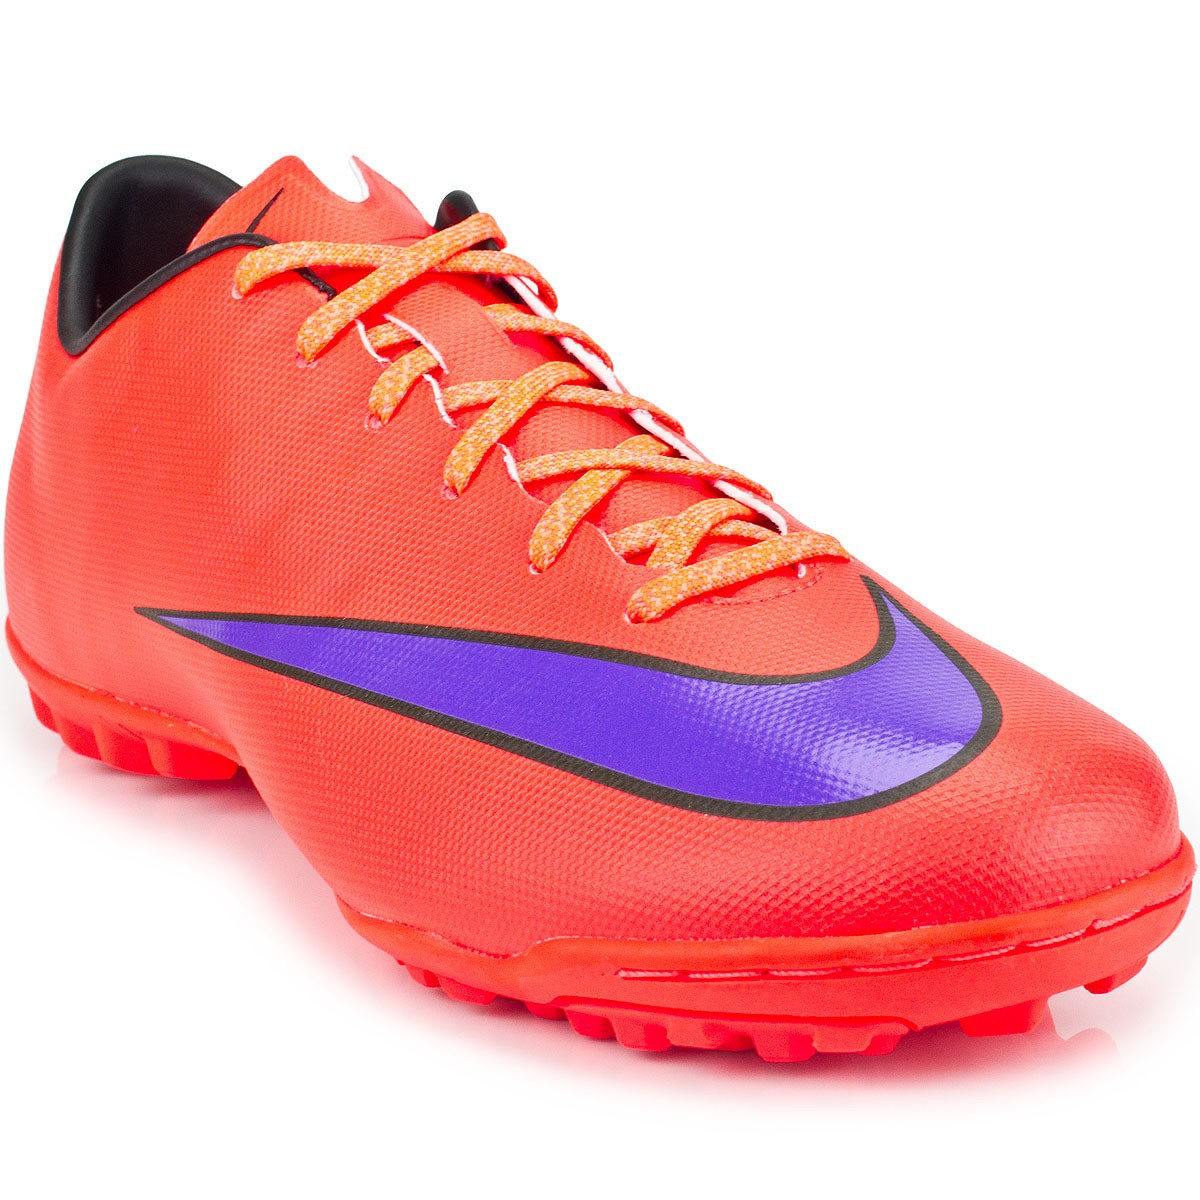 3ca37a1ab2 Chuteira Nike Mercurial Victory V TF 651646